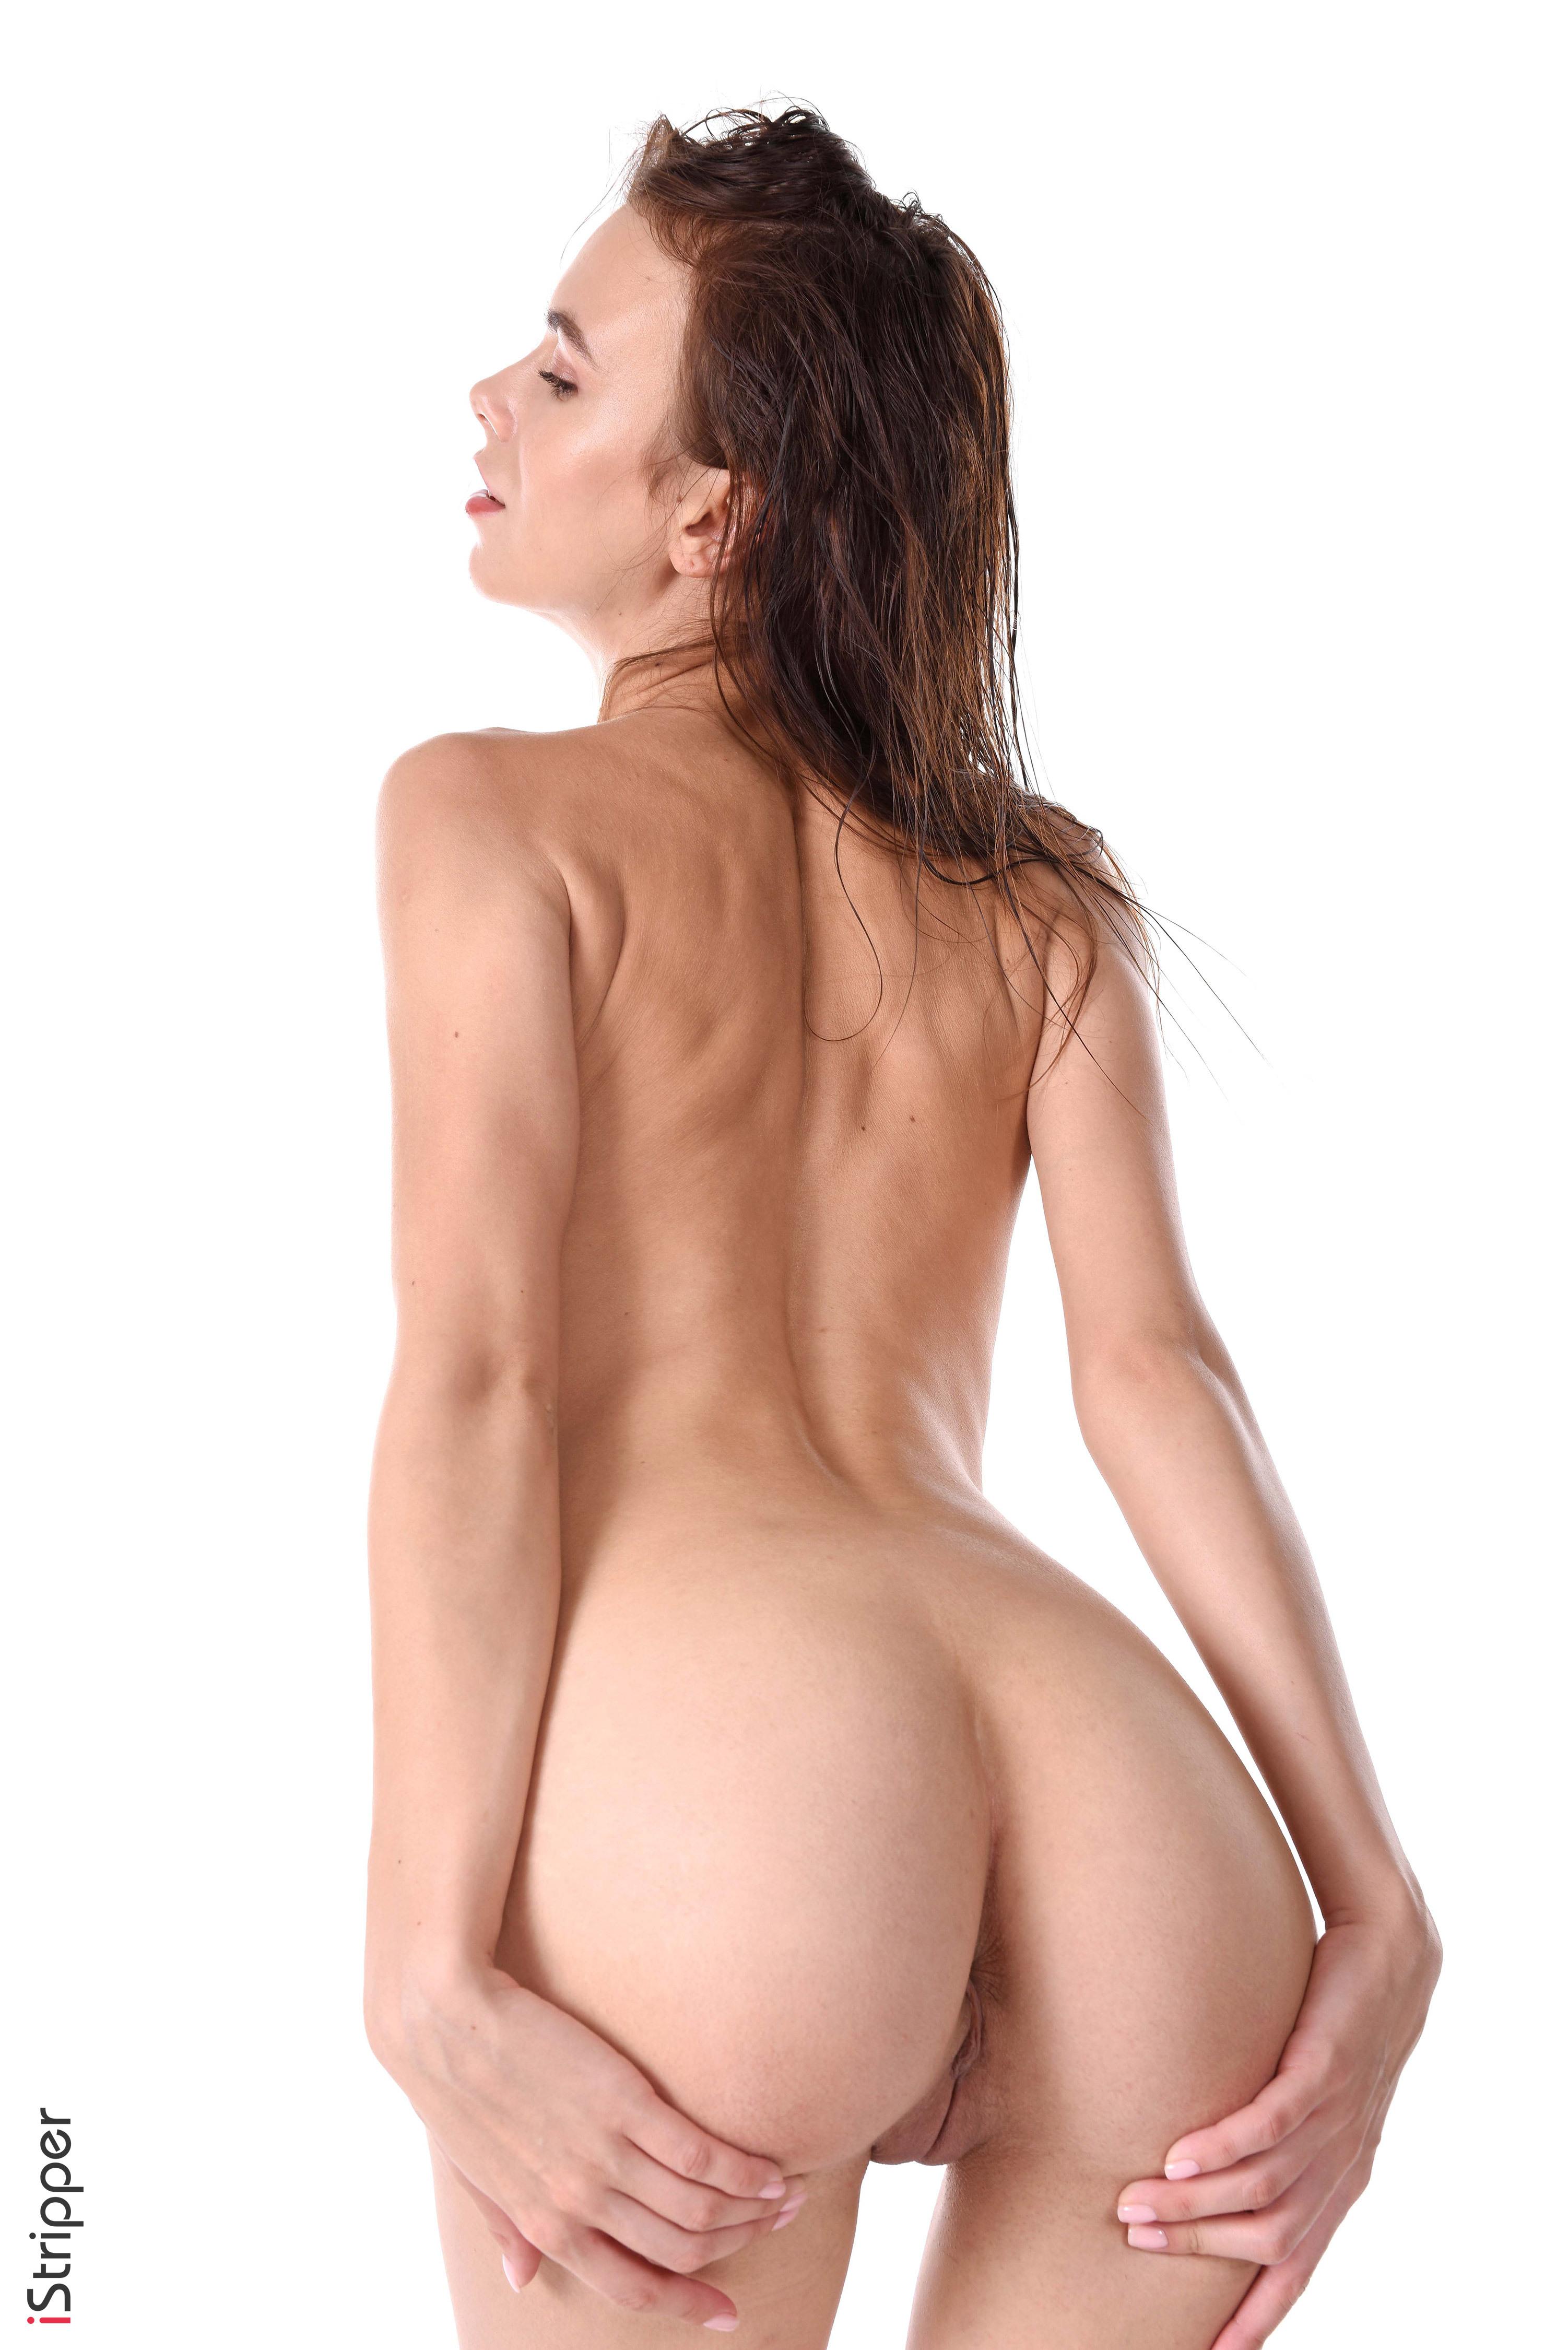 beautiful Nude Beauties wallpaper